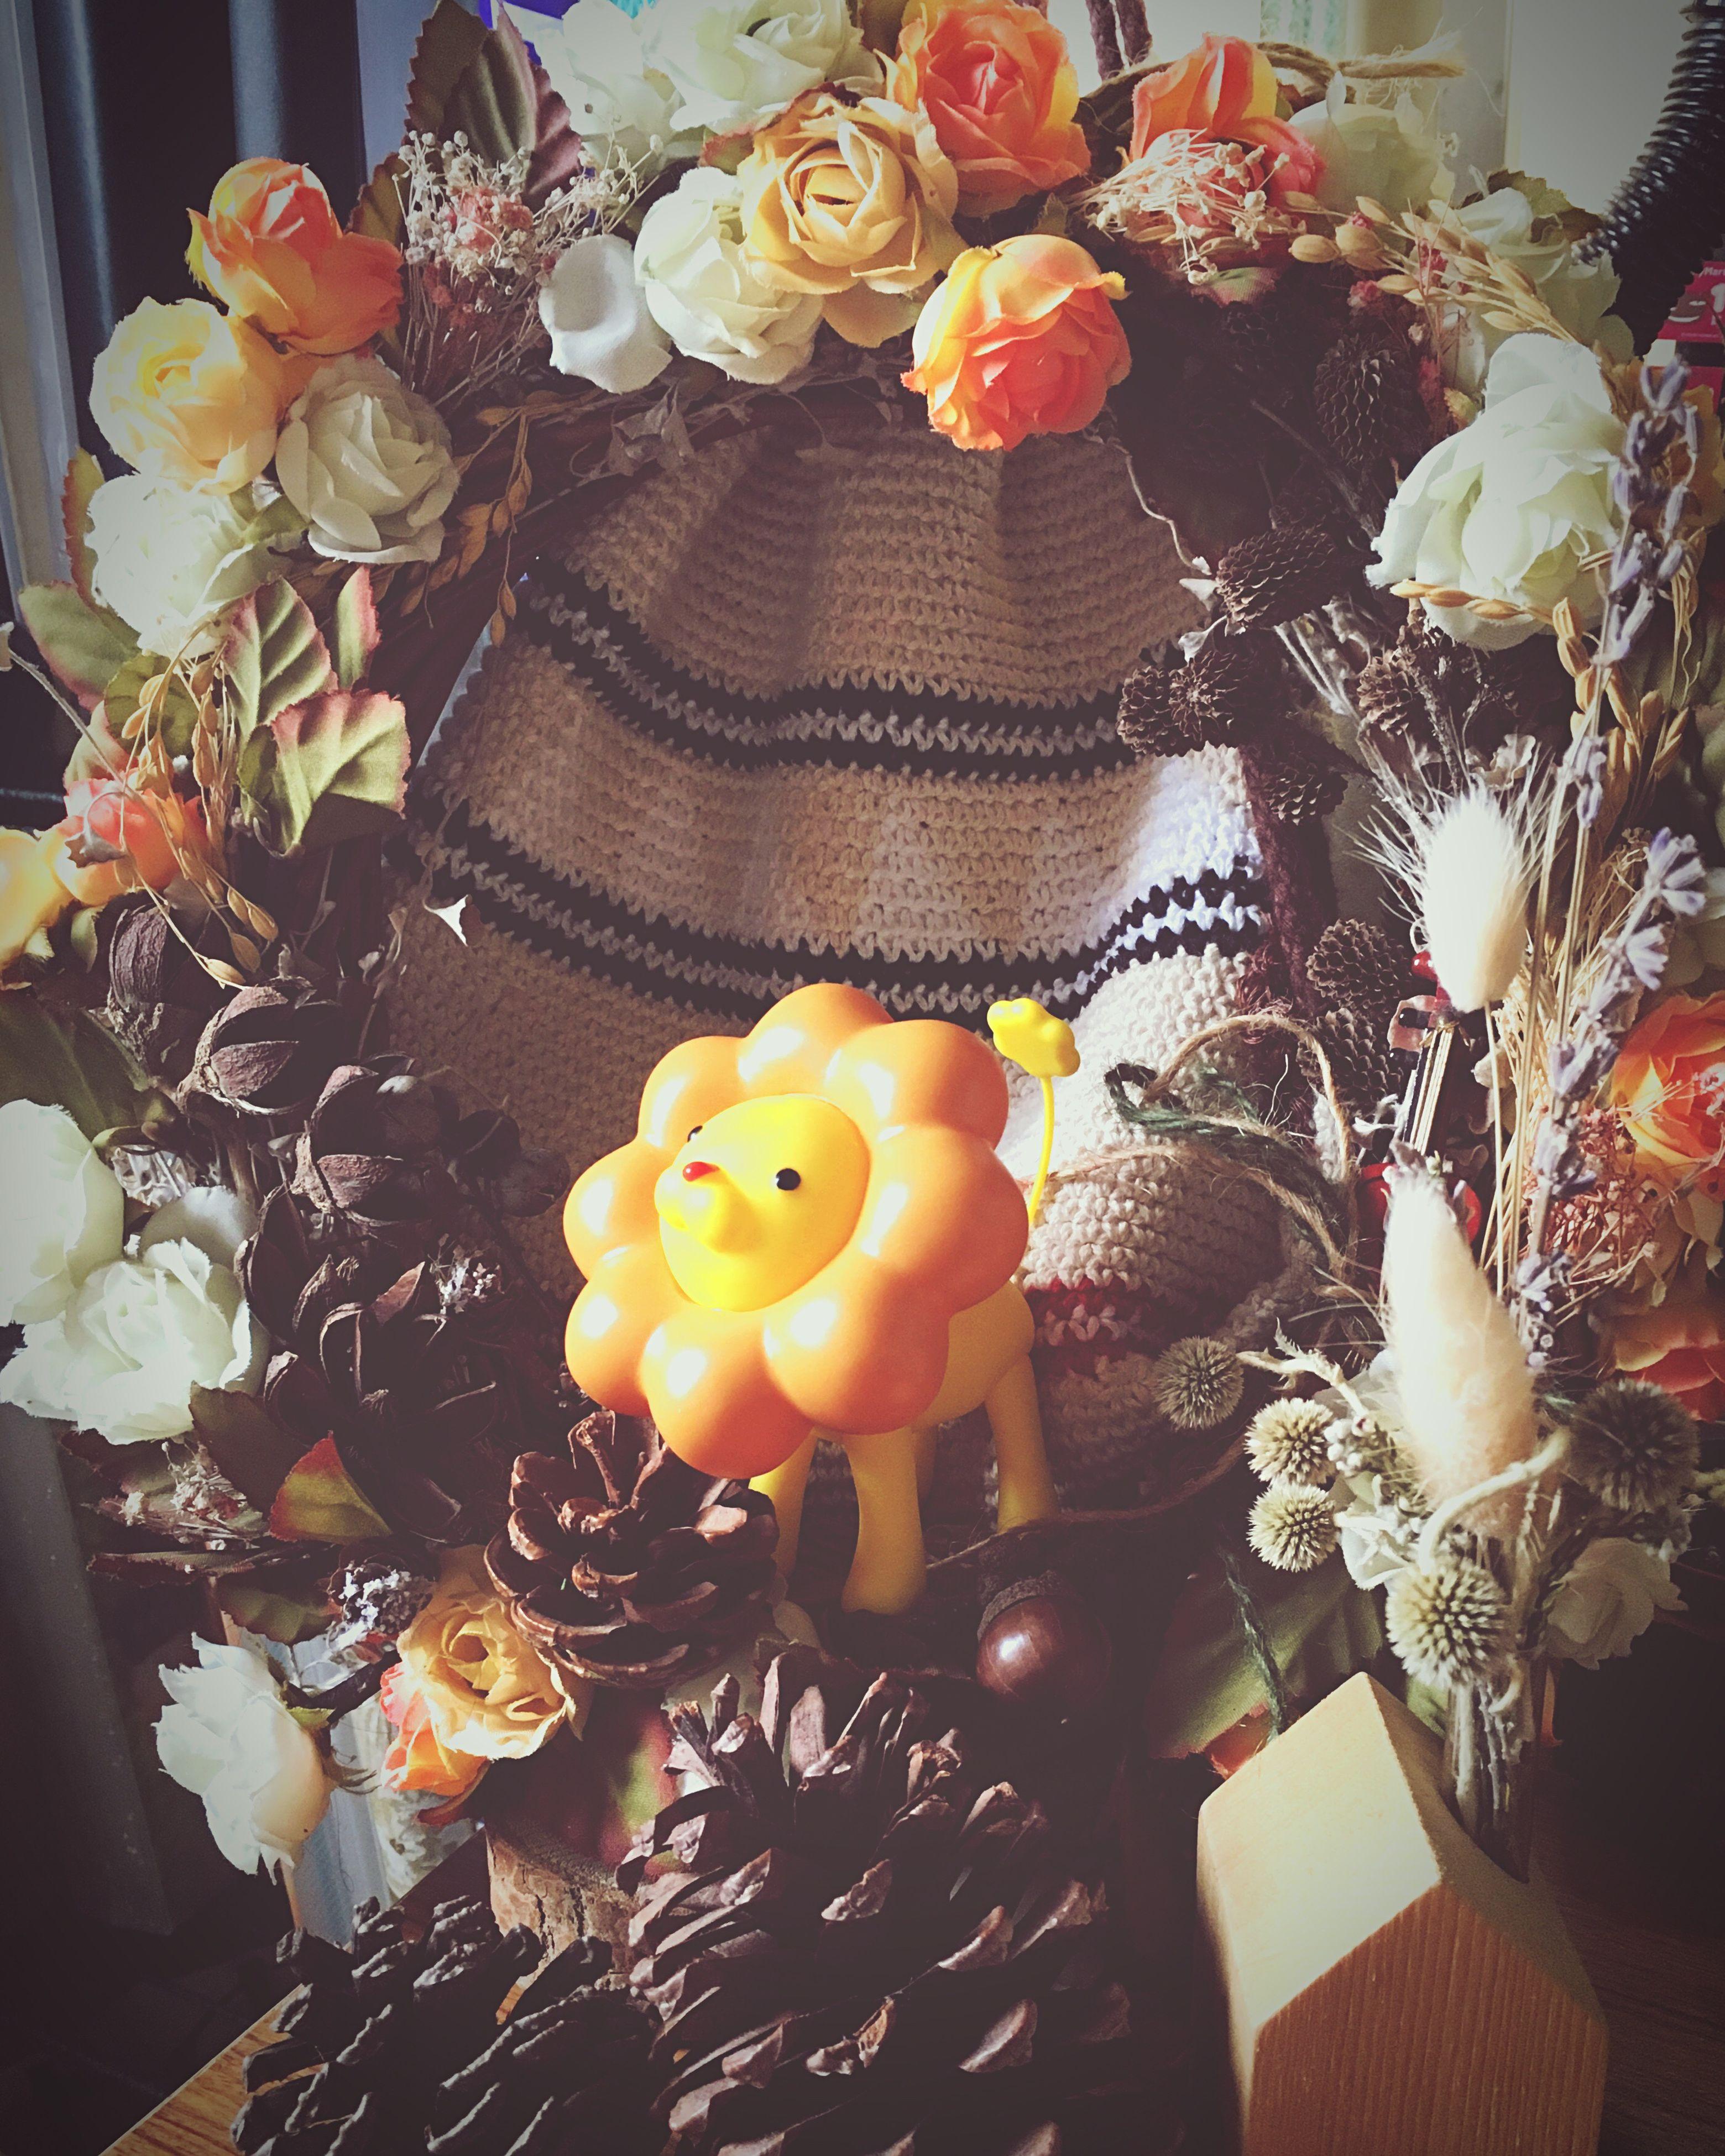 decoration, flower, celebration, decor, variation, still life, no people, close-up, multi colored, fragility, illuminated, petal, electric lamp, arrangement